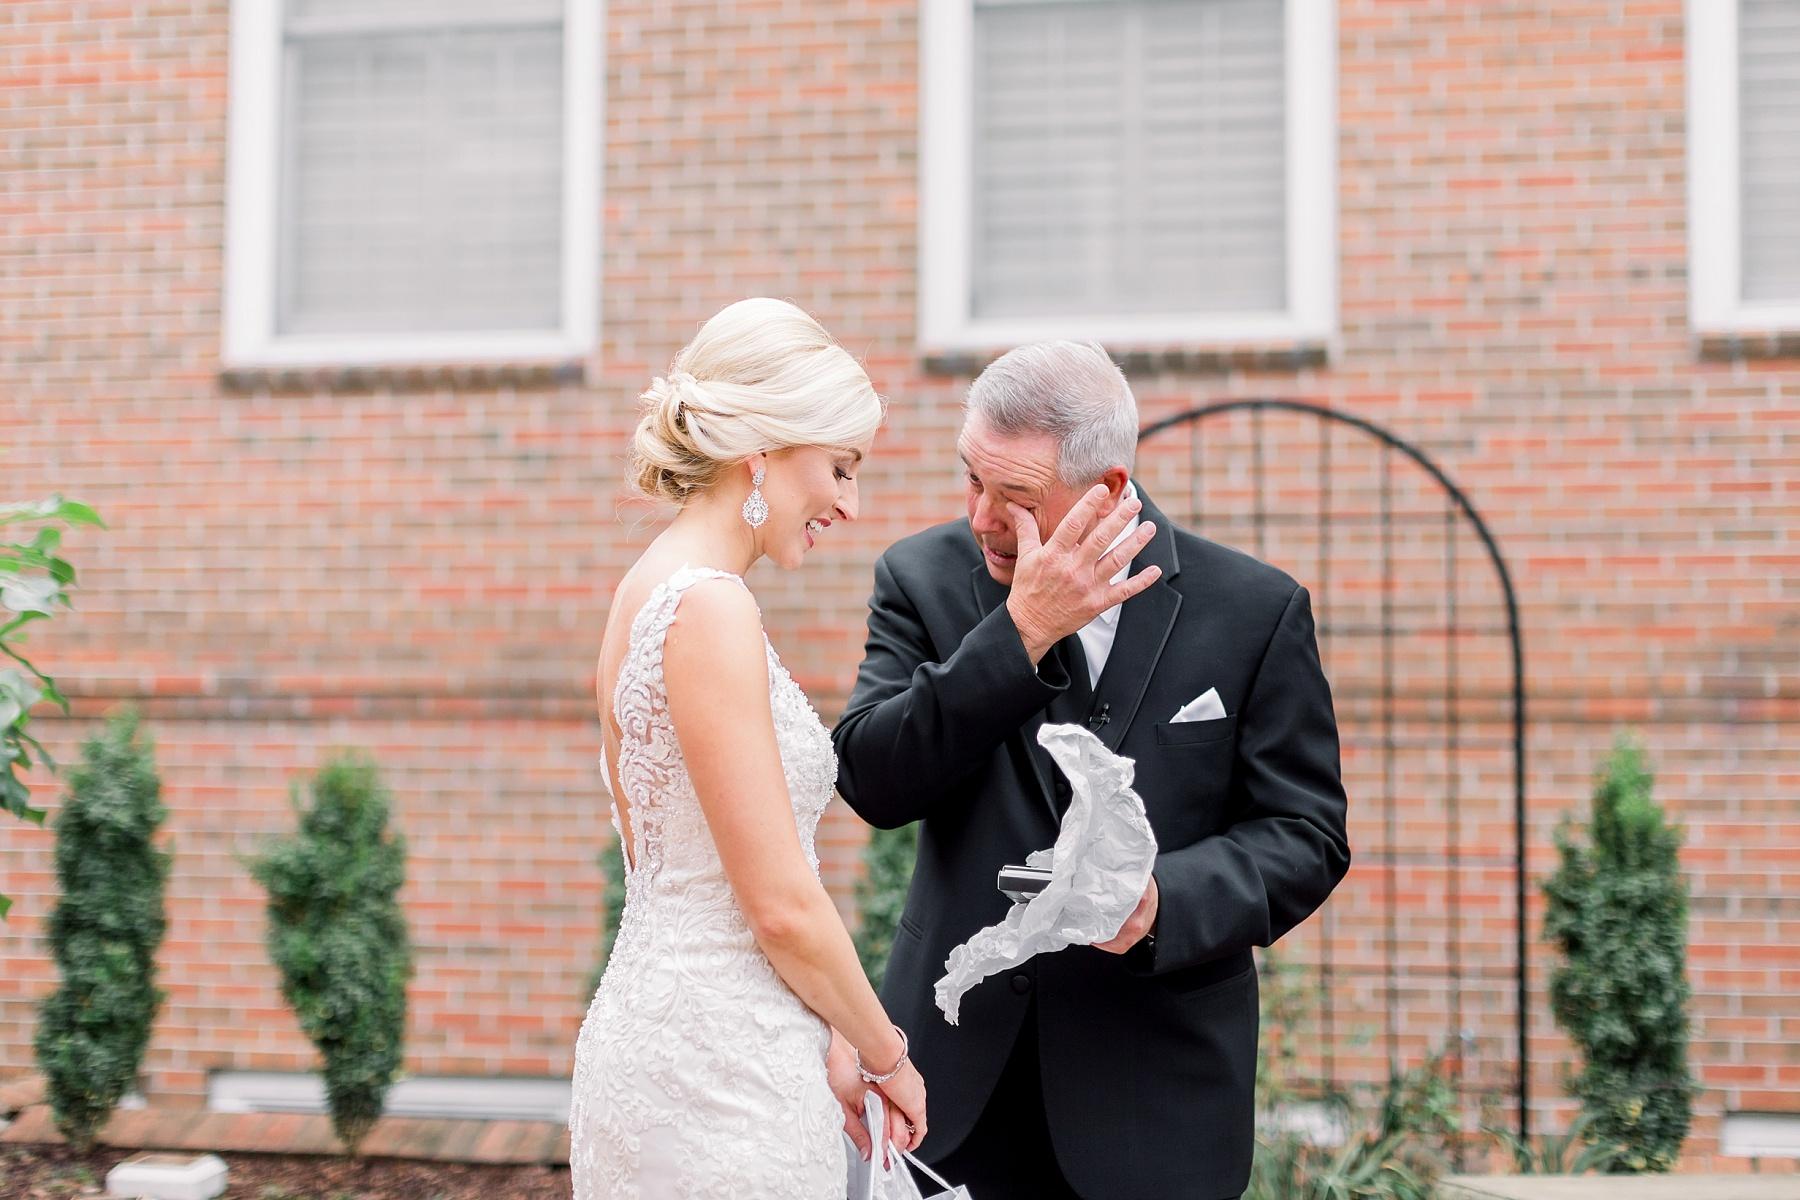 midwest-adventurous-wedding-photographer-elizabeth-ladean-photography-photo_4713.jpg